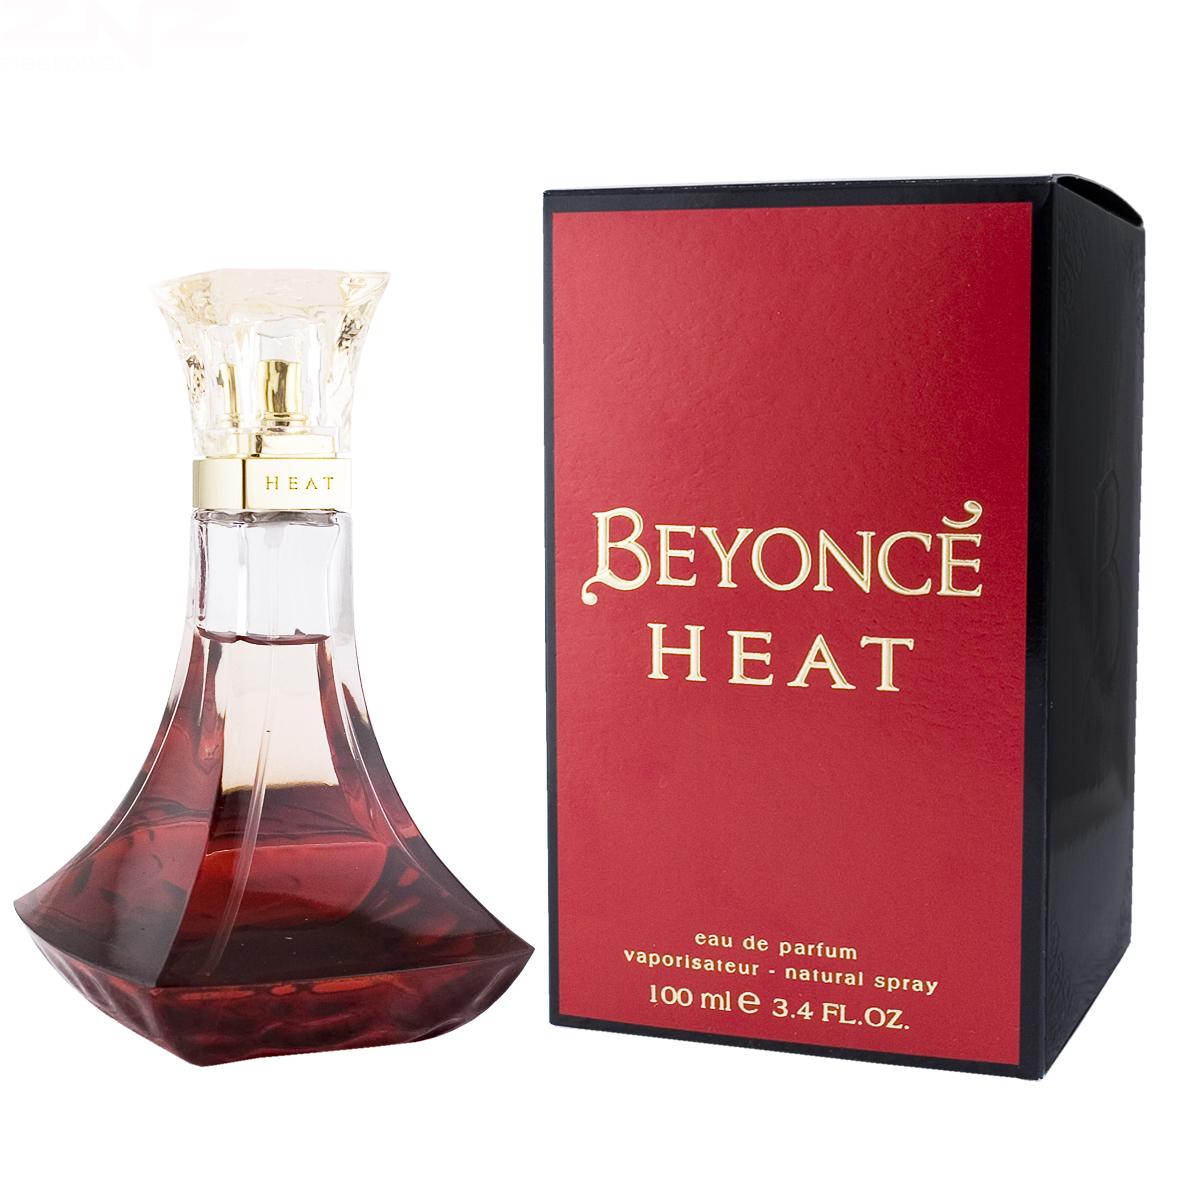 Beyonce Heat Eau De Parfum 100 ml (woman) 58313